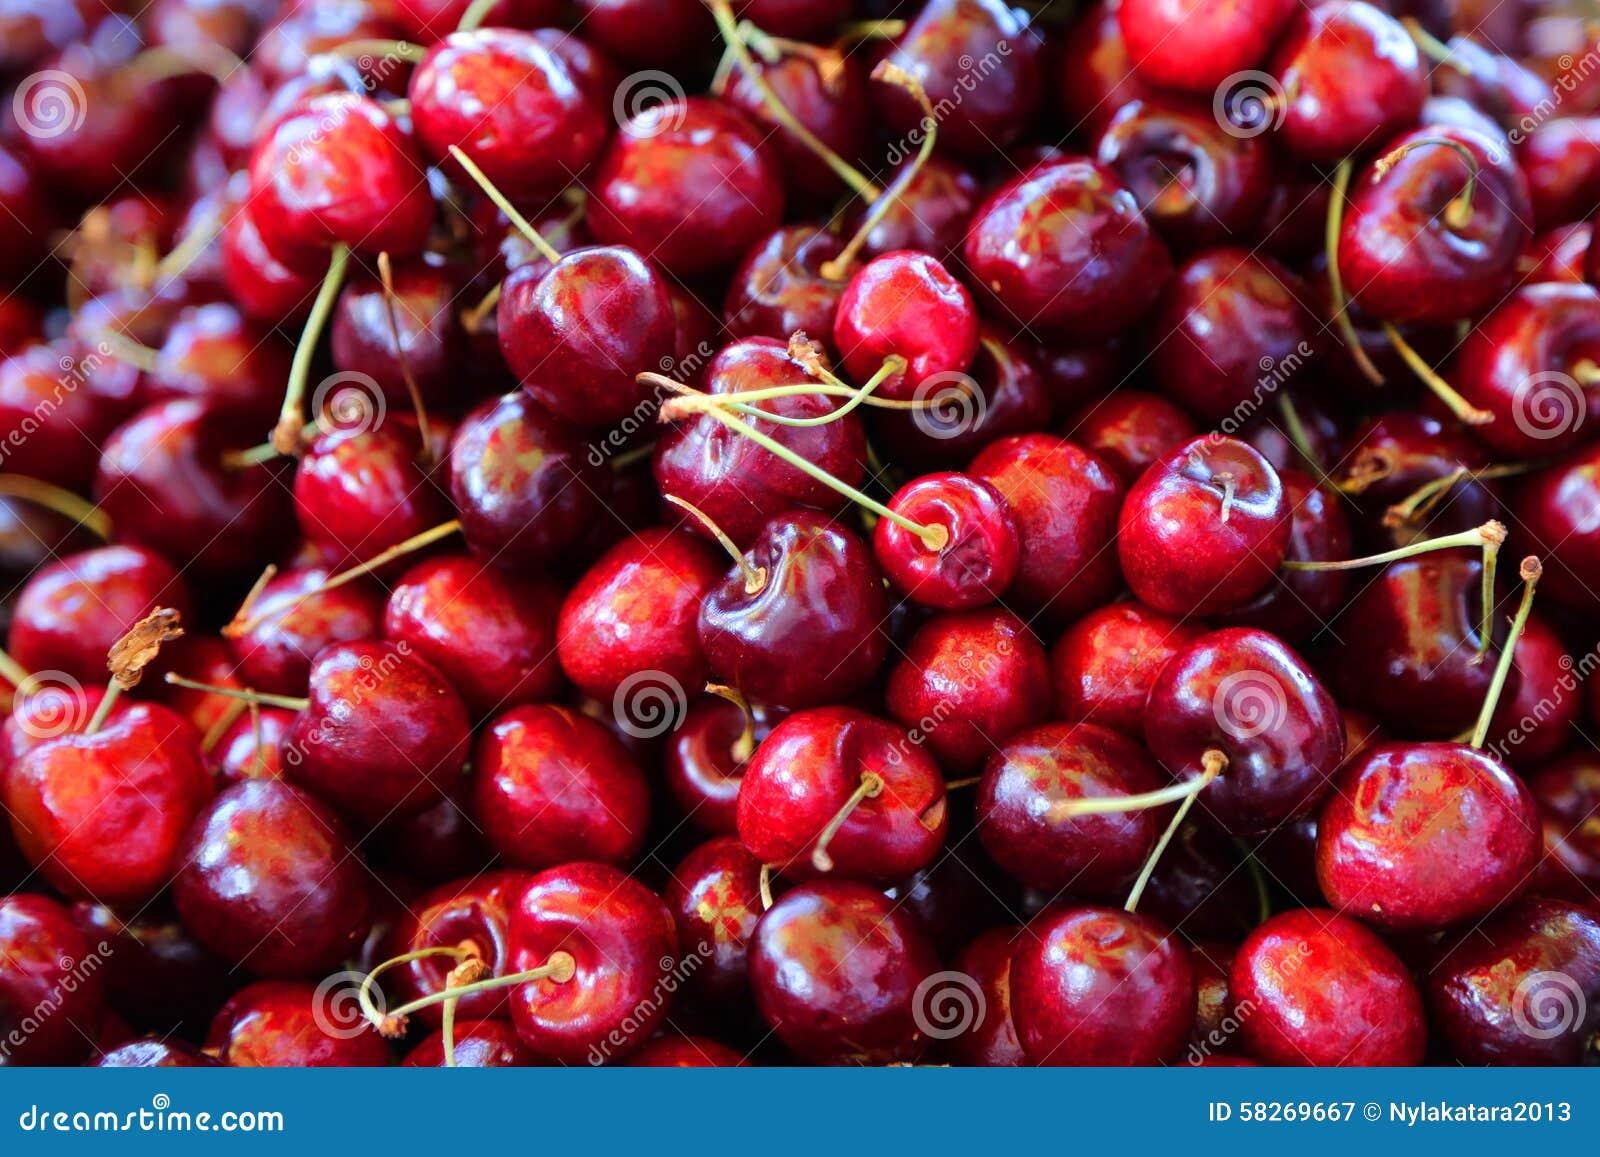 Cherries Stock Photo - Image: 58269667